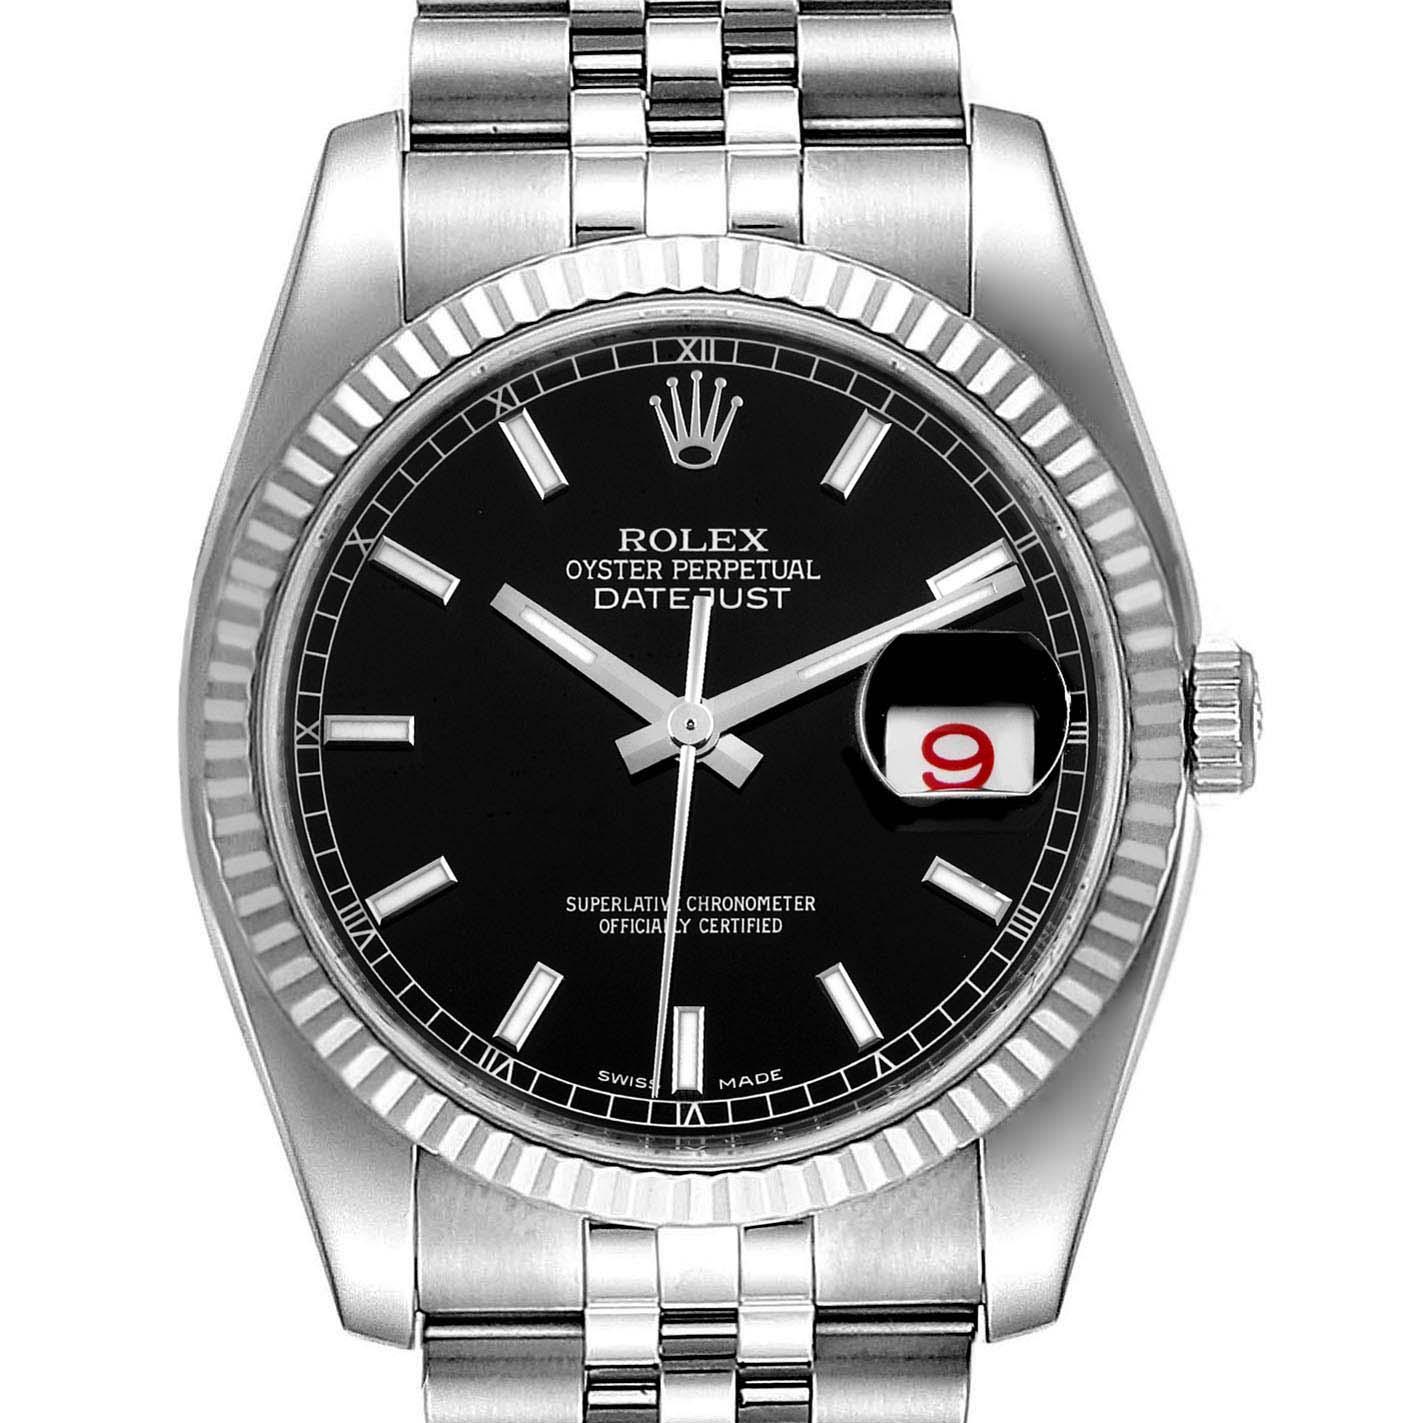 Rolex Datejust Steel White Gold Black Dial Mens Watch 116234 Box Card